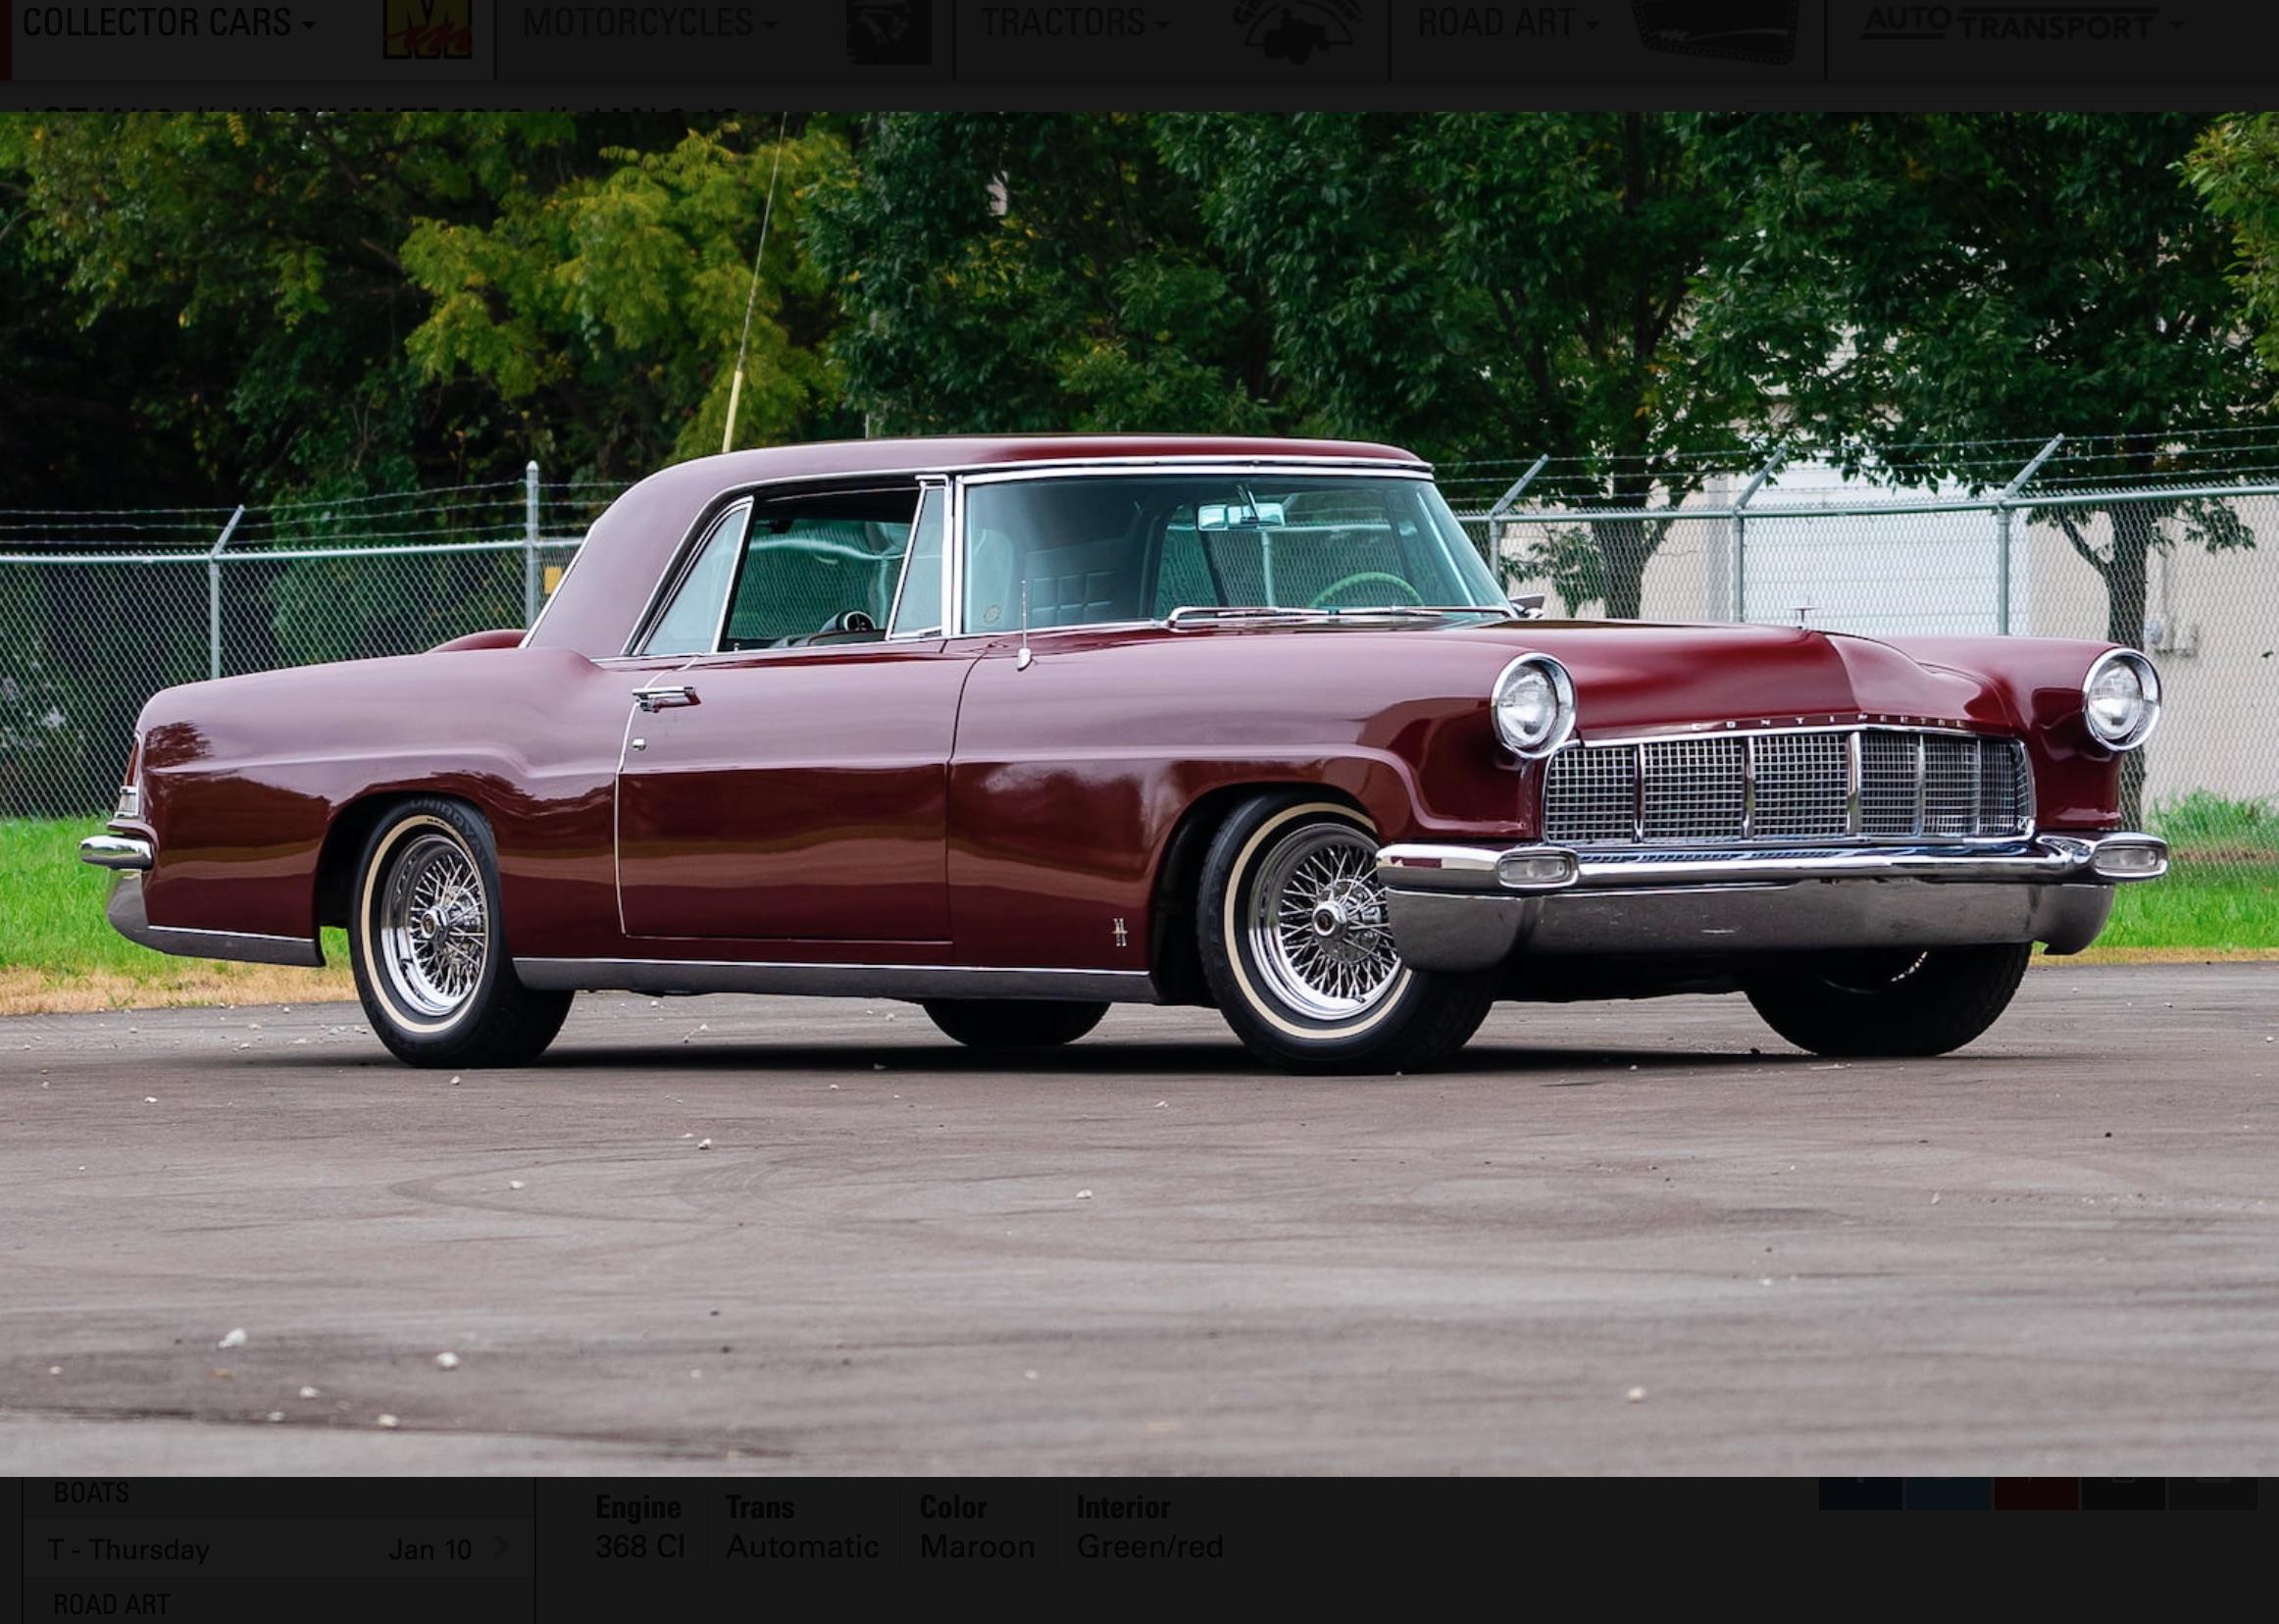 Money No Object: 1956 Continental Mark II – Hand-Built American Luxury